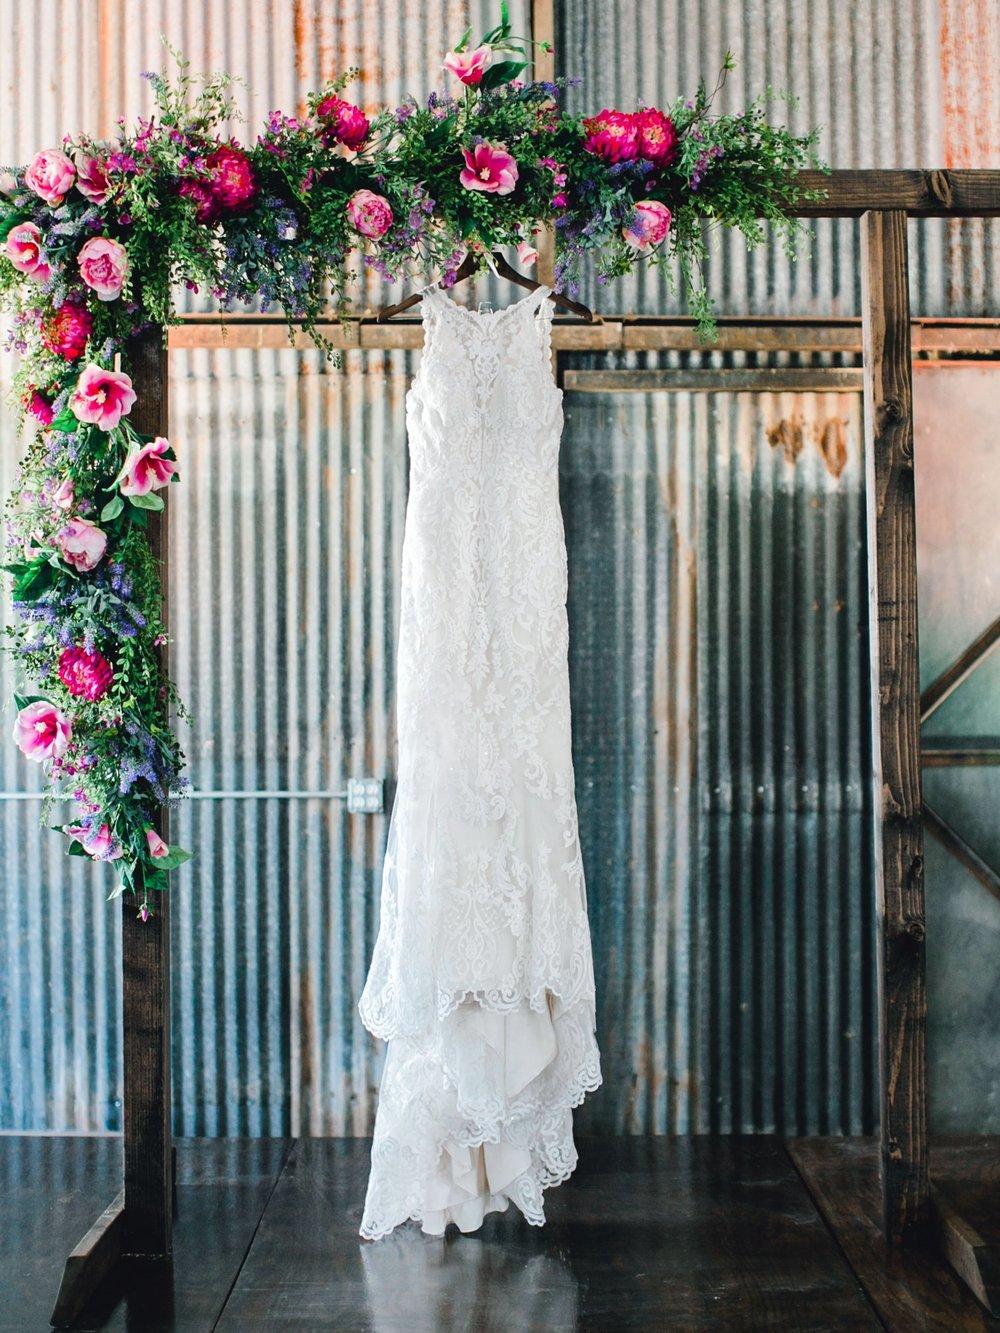 Jenna-and-garrett-Everett-kitalou-gin-lubbock-wedding-dayspring-designs-lubbock-wedding-photographer_0002.jpg